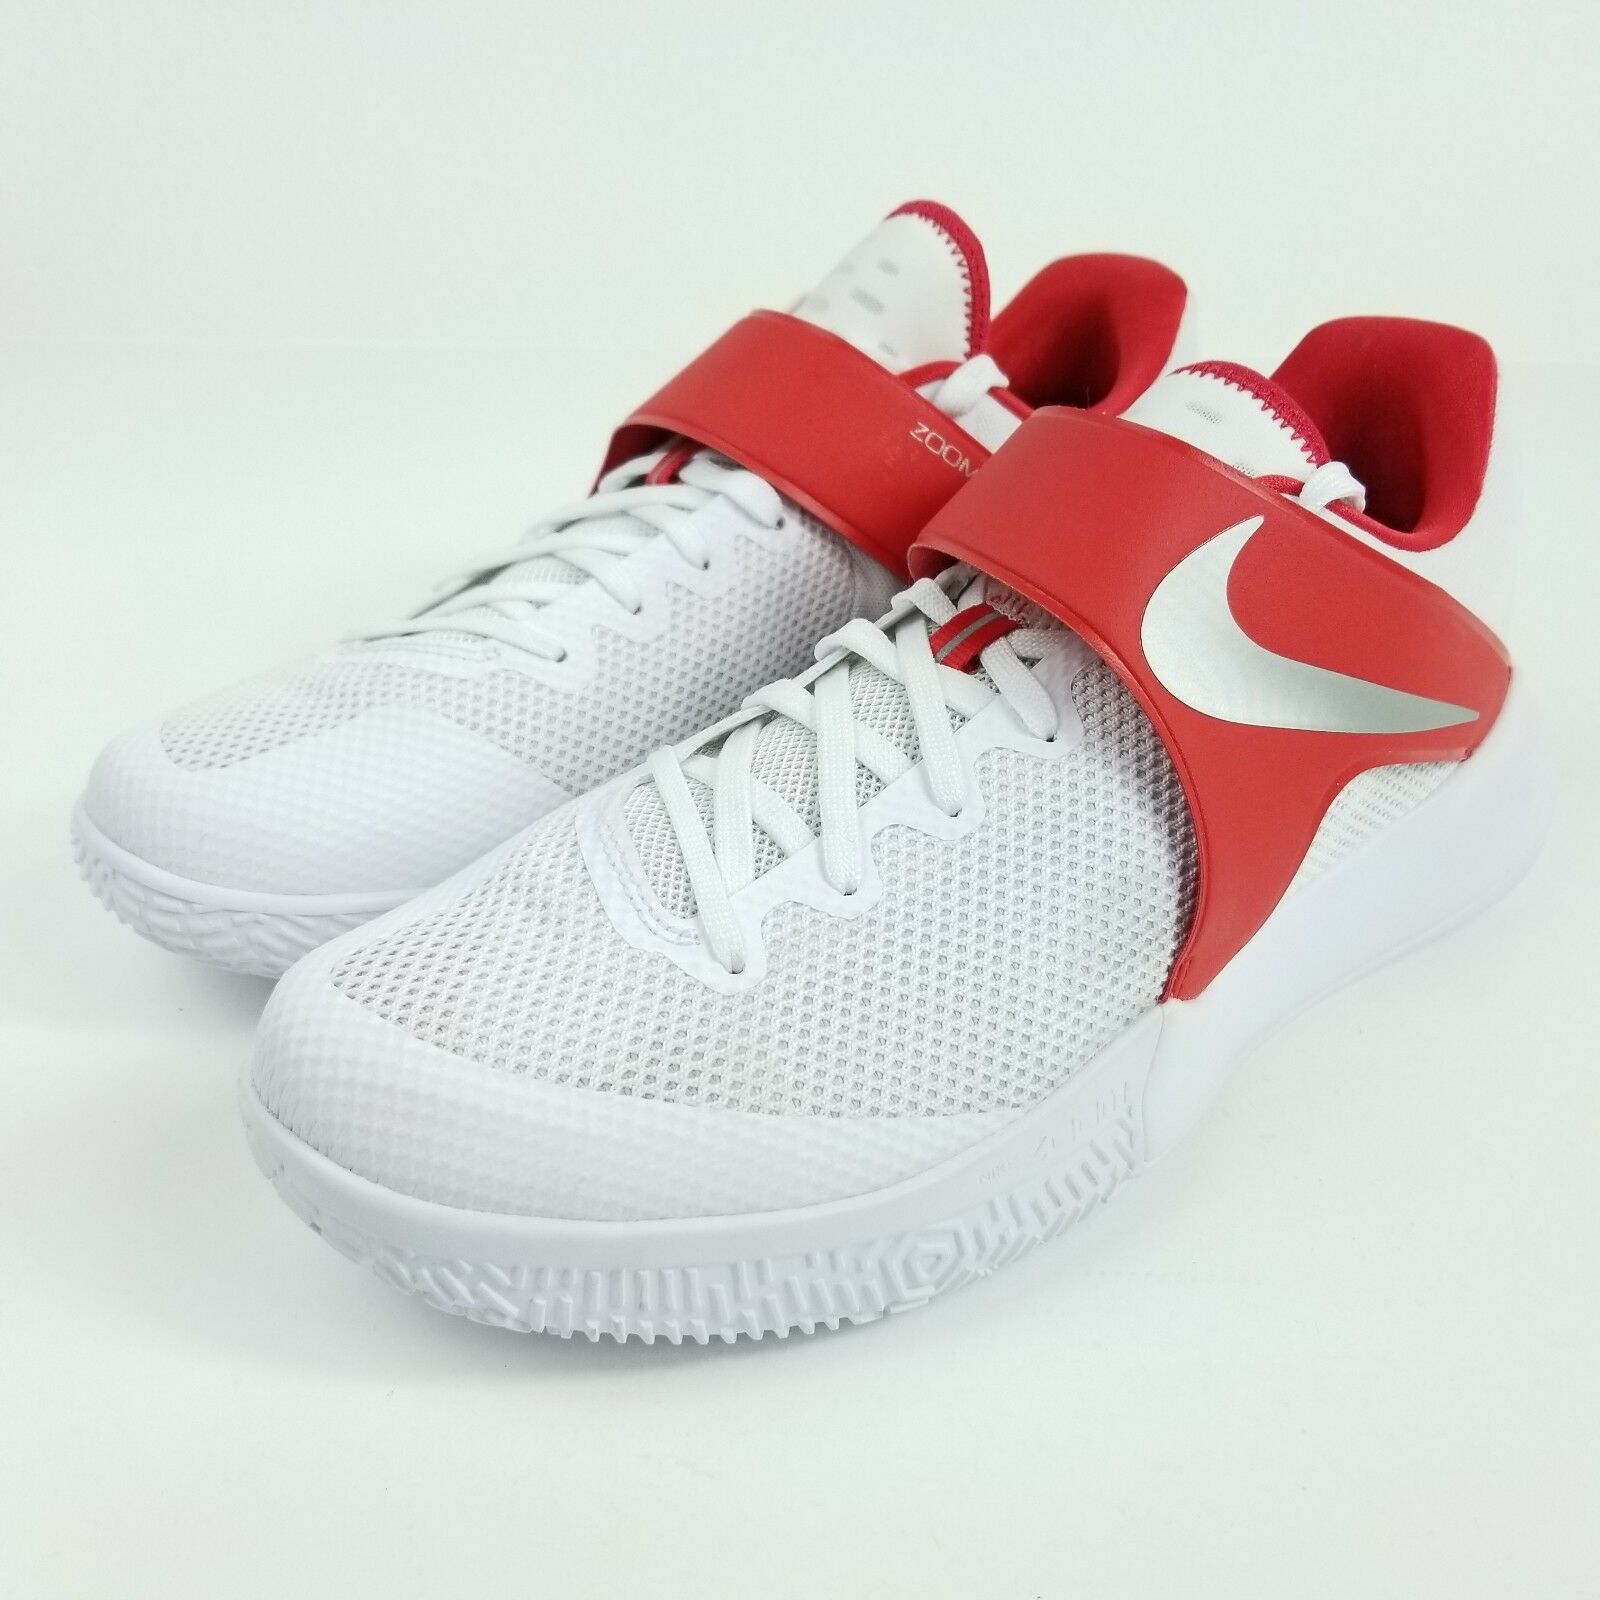 NIKE Zoom Live TB Promo Mens Sz 13.5 Shoes White Red 902590 160